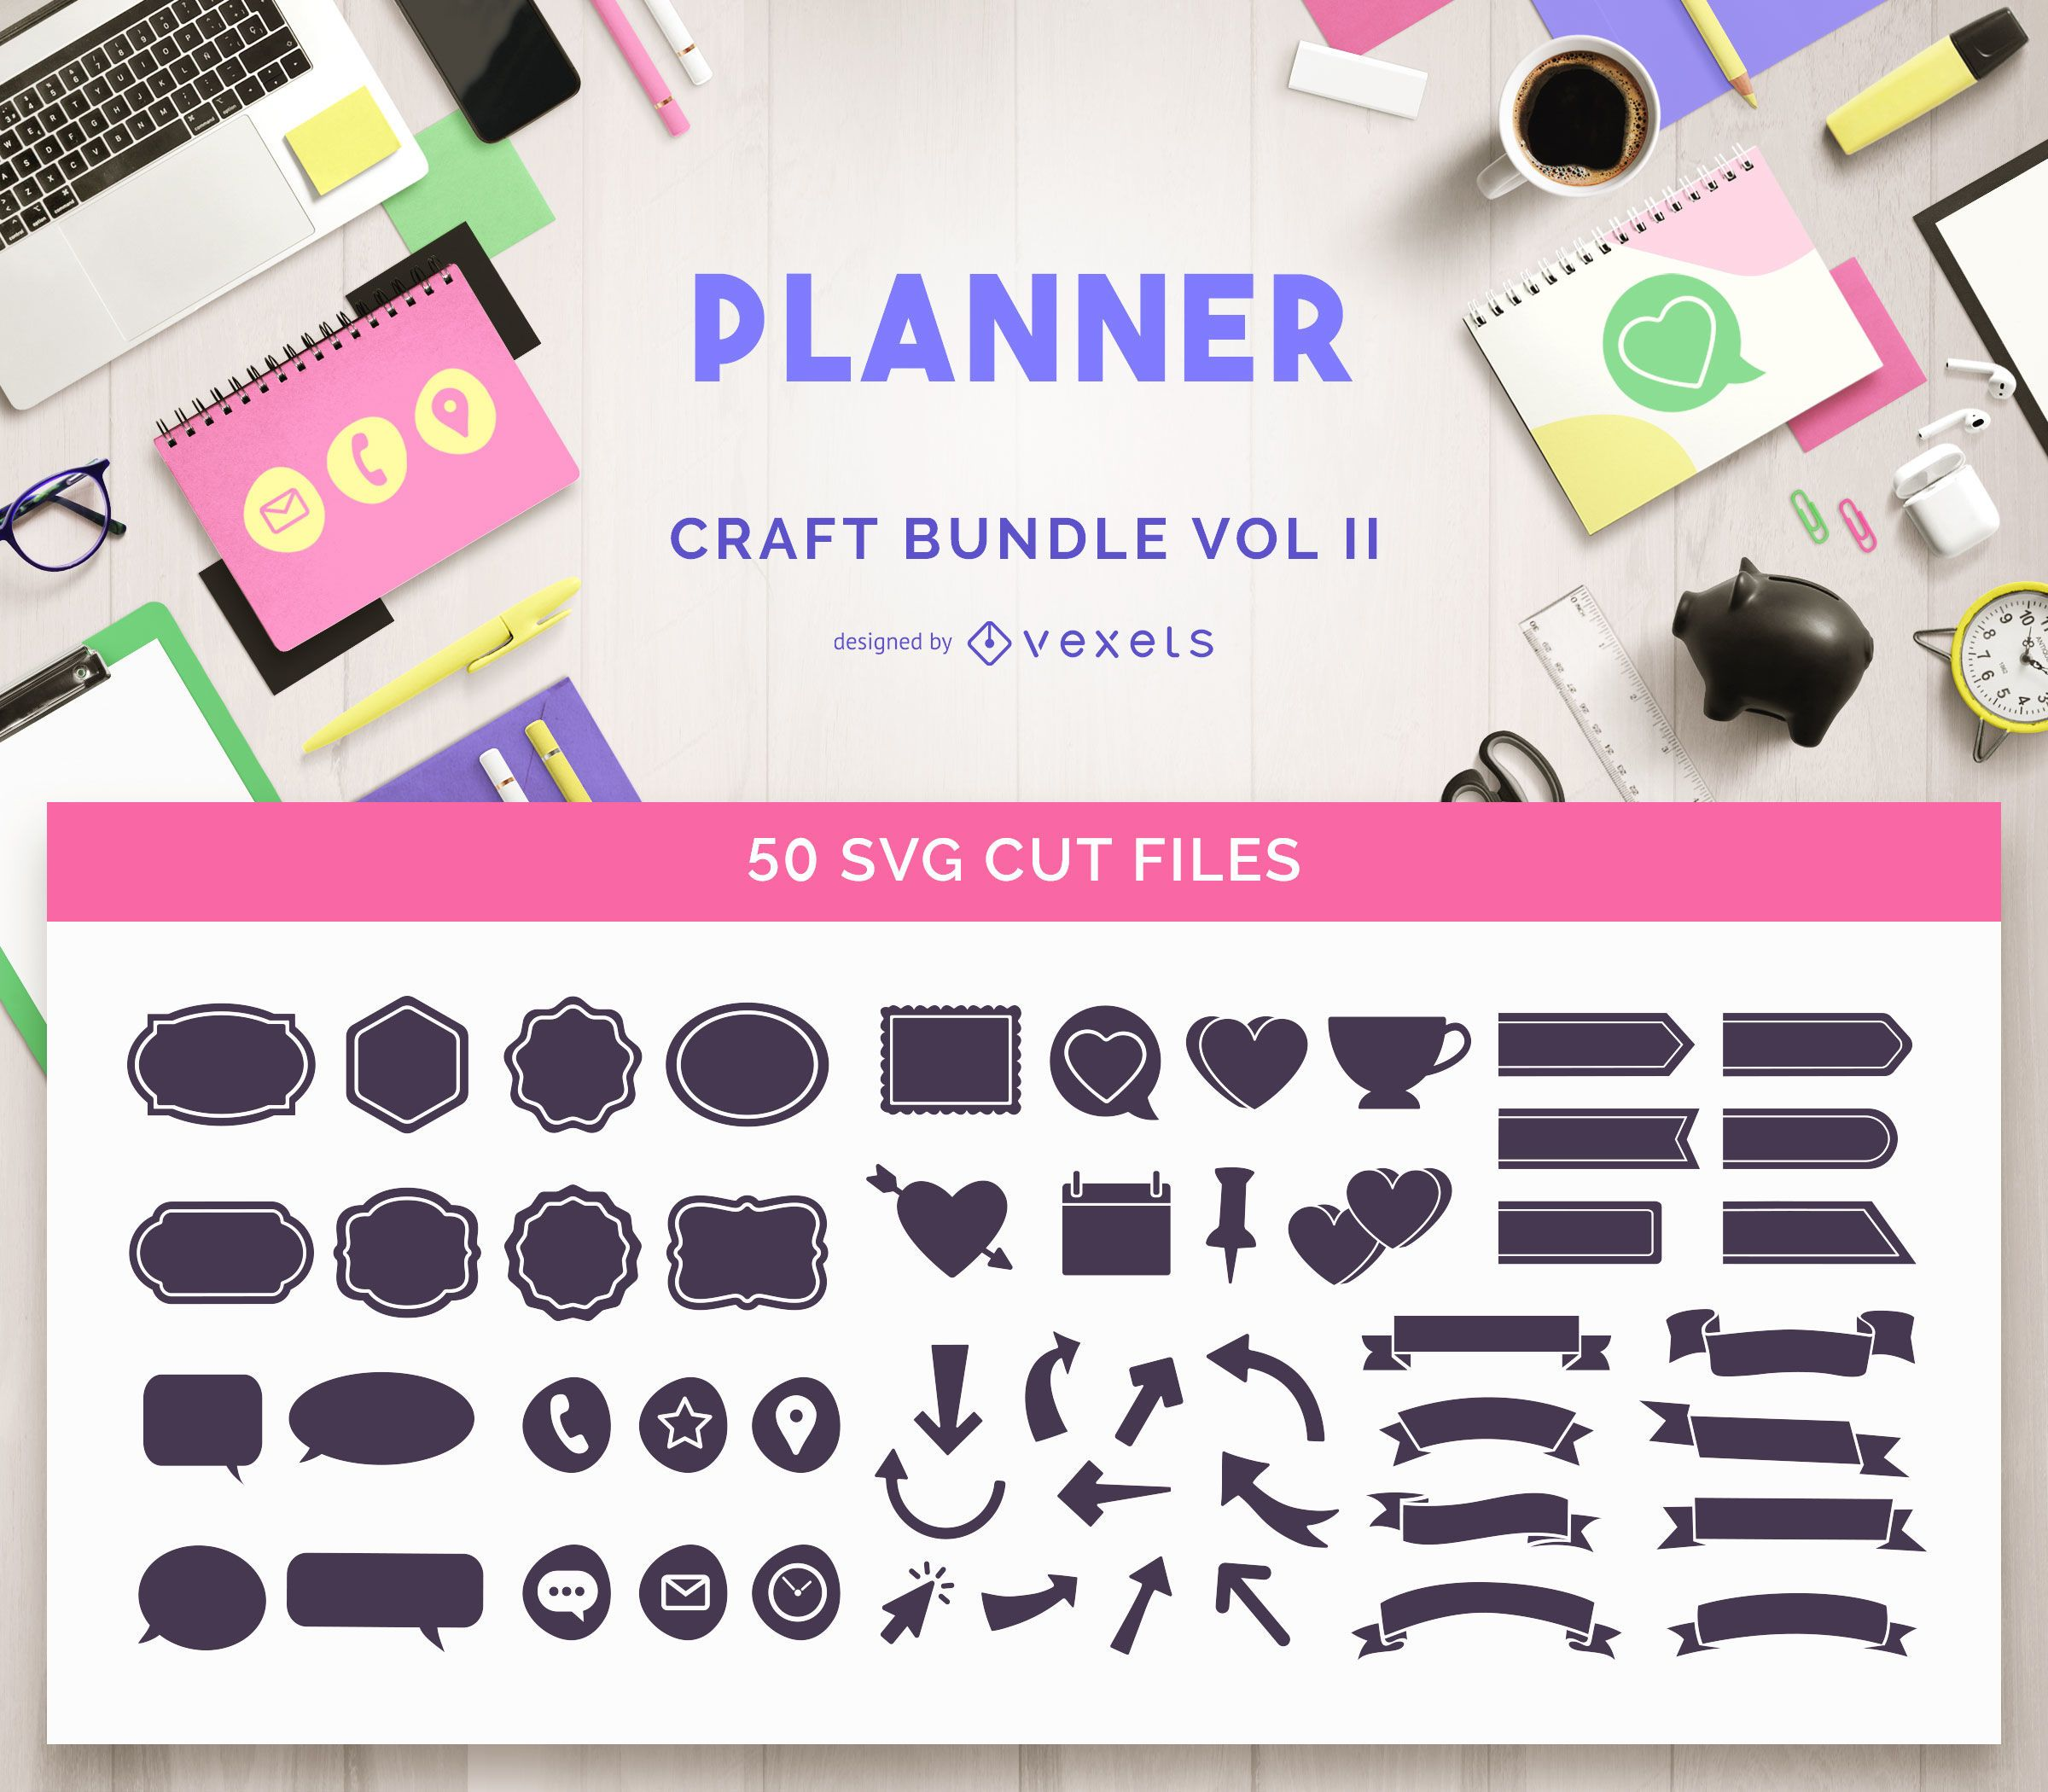 Planner Craft Bundle Vol II